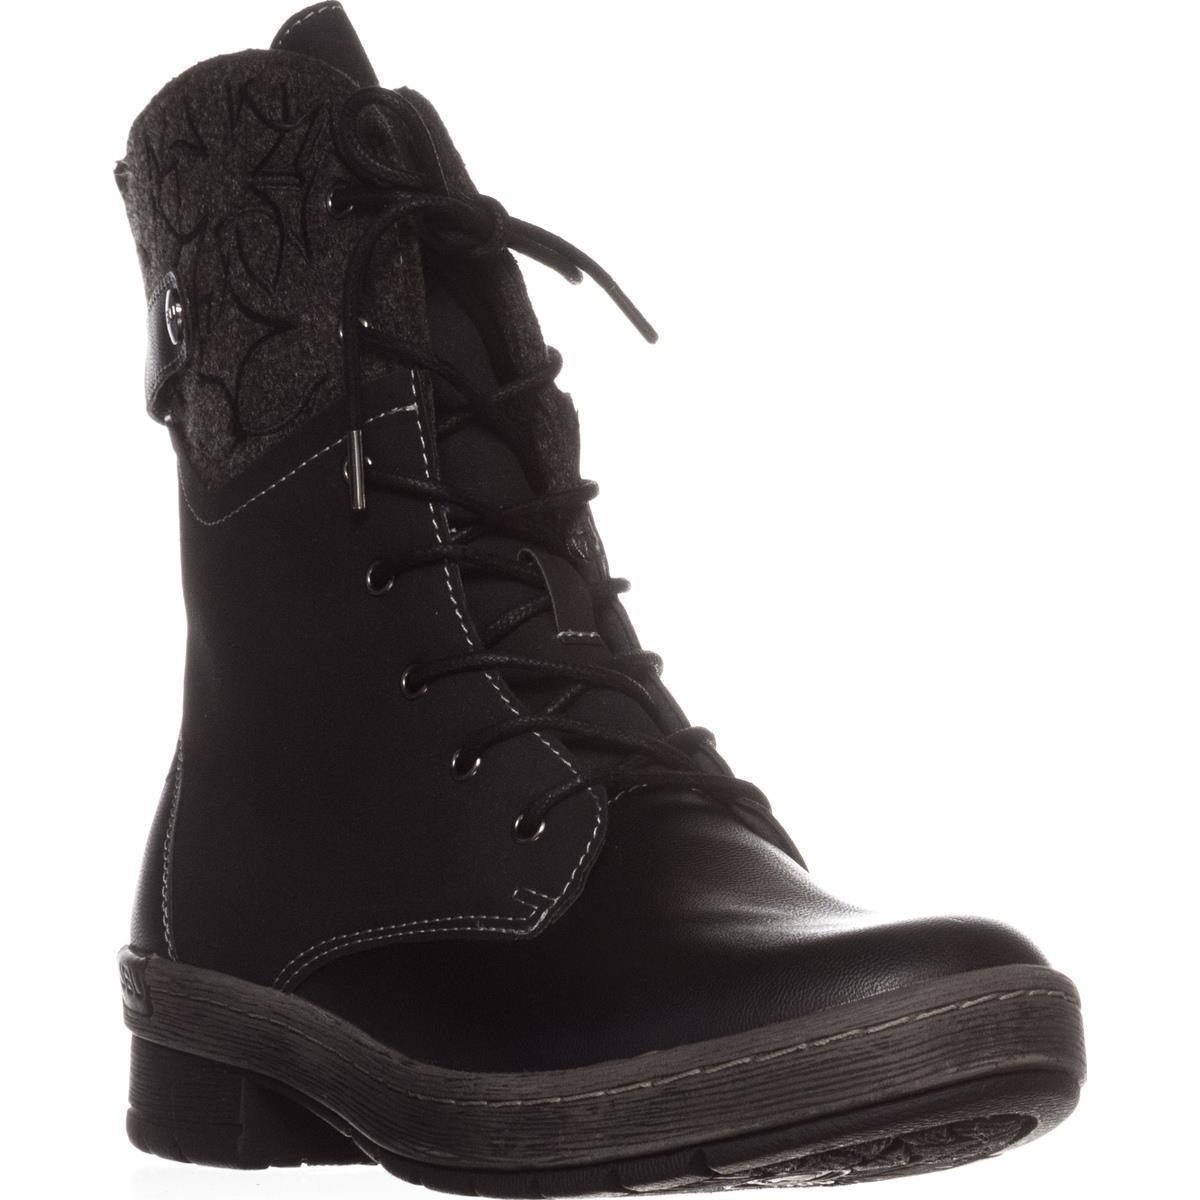 2e87c29912567 JBU by Jambu Hemlock Encore Winter Boots, Black